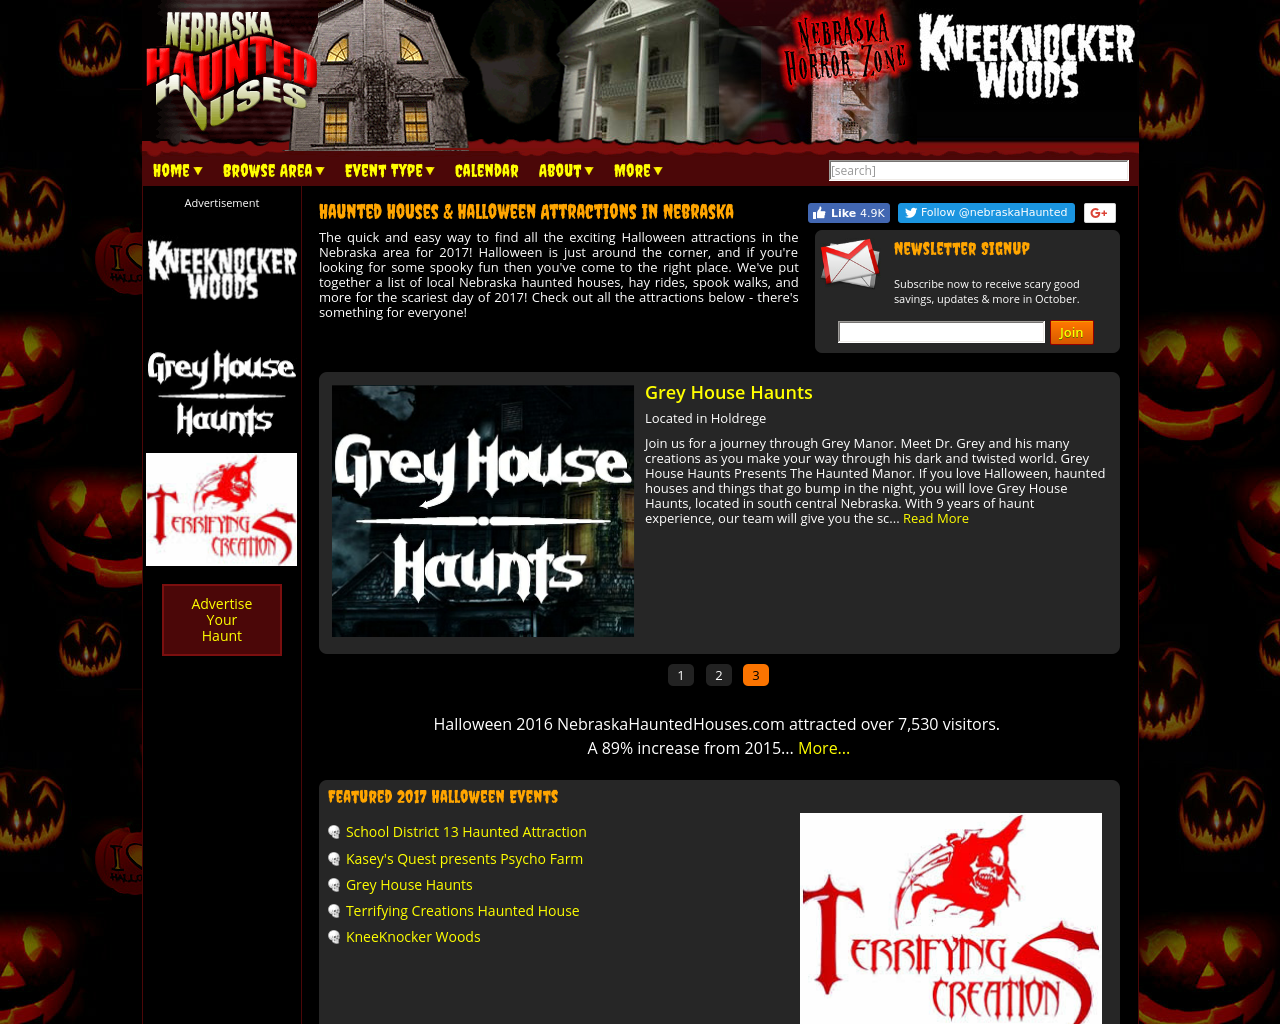 Nebraska-Haunted-Houses-Advertising-Reviews-Pricing